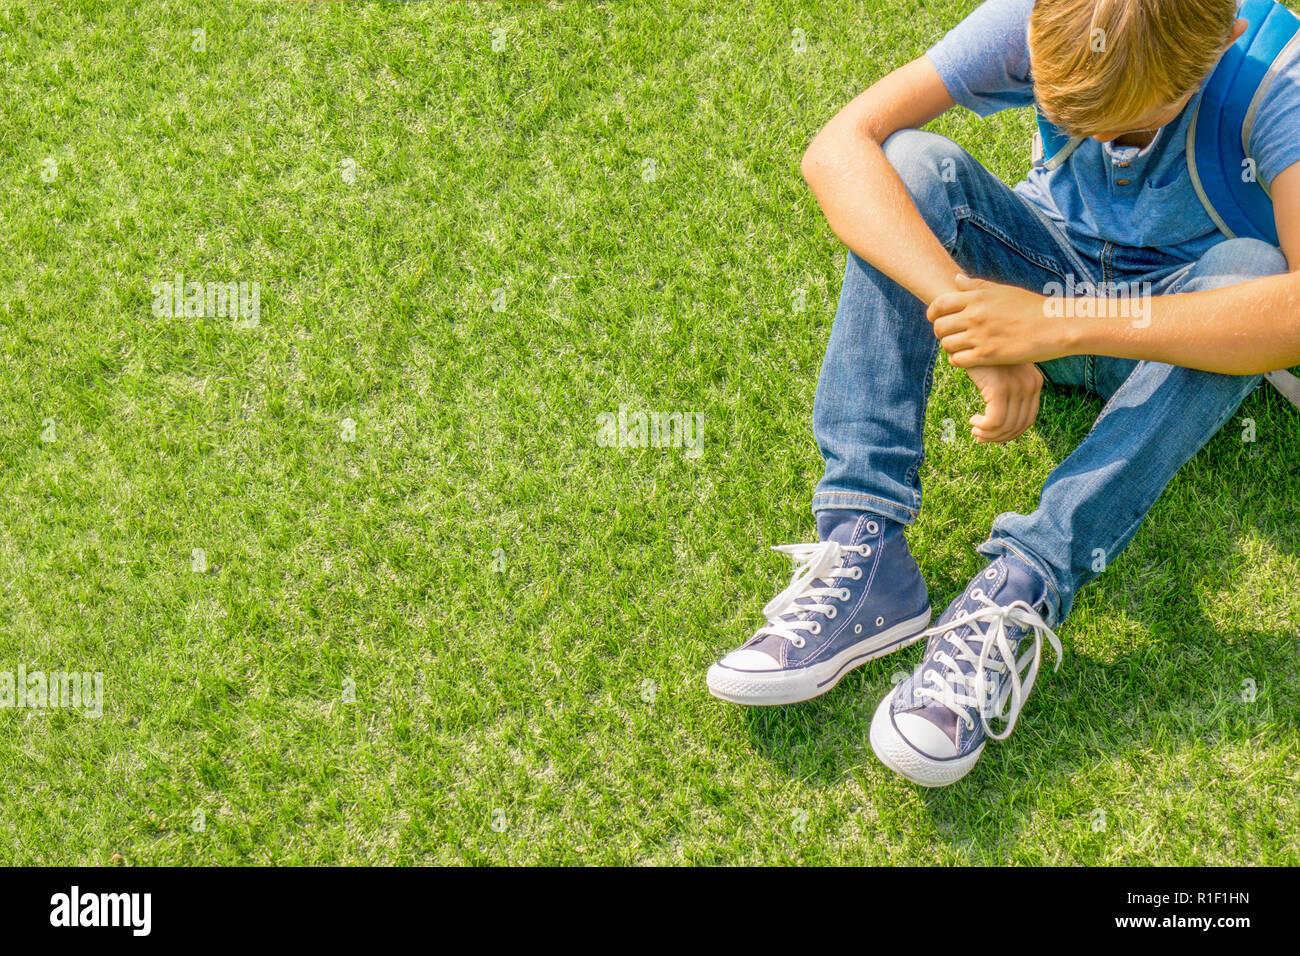 Unhappy sad upset boy sitting alone on the grass. - Stock Image